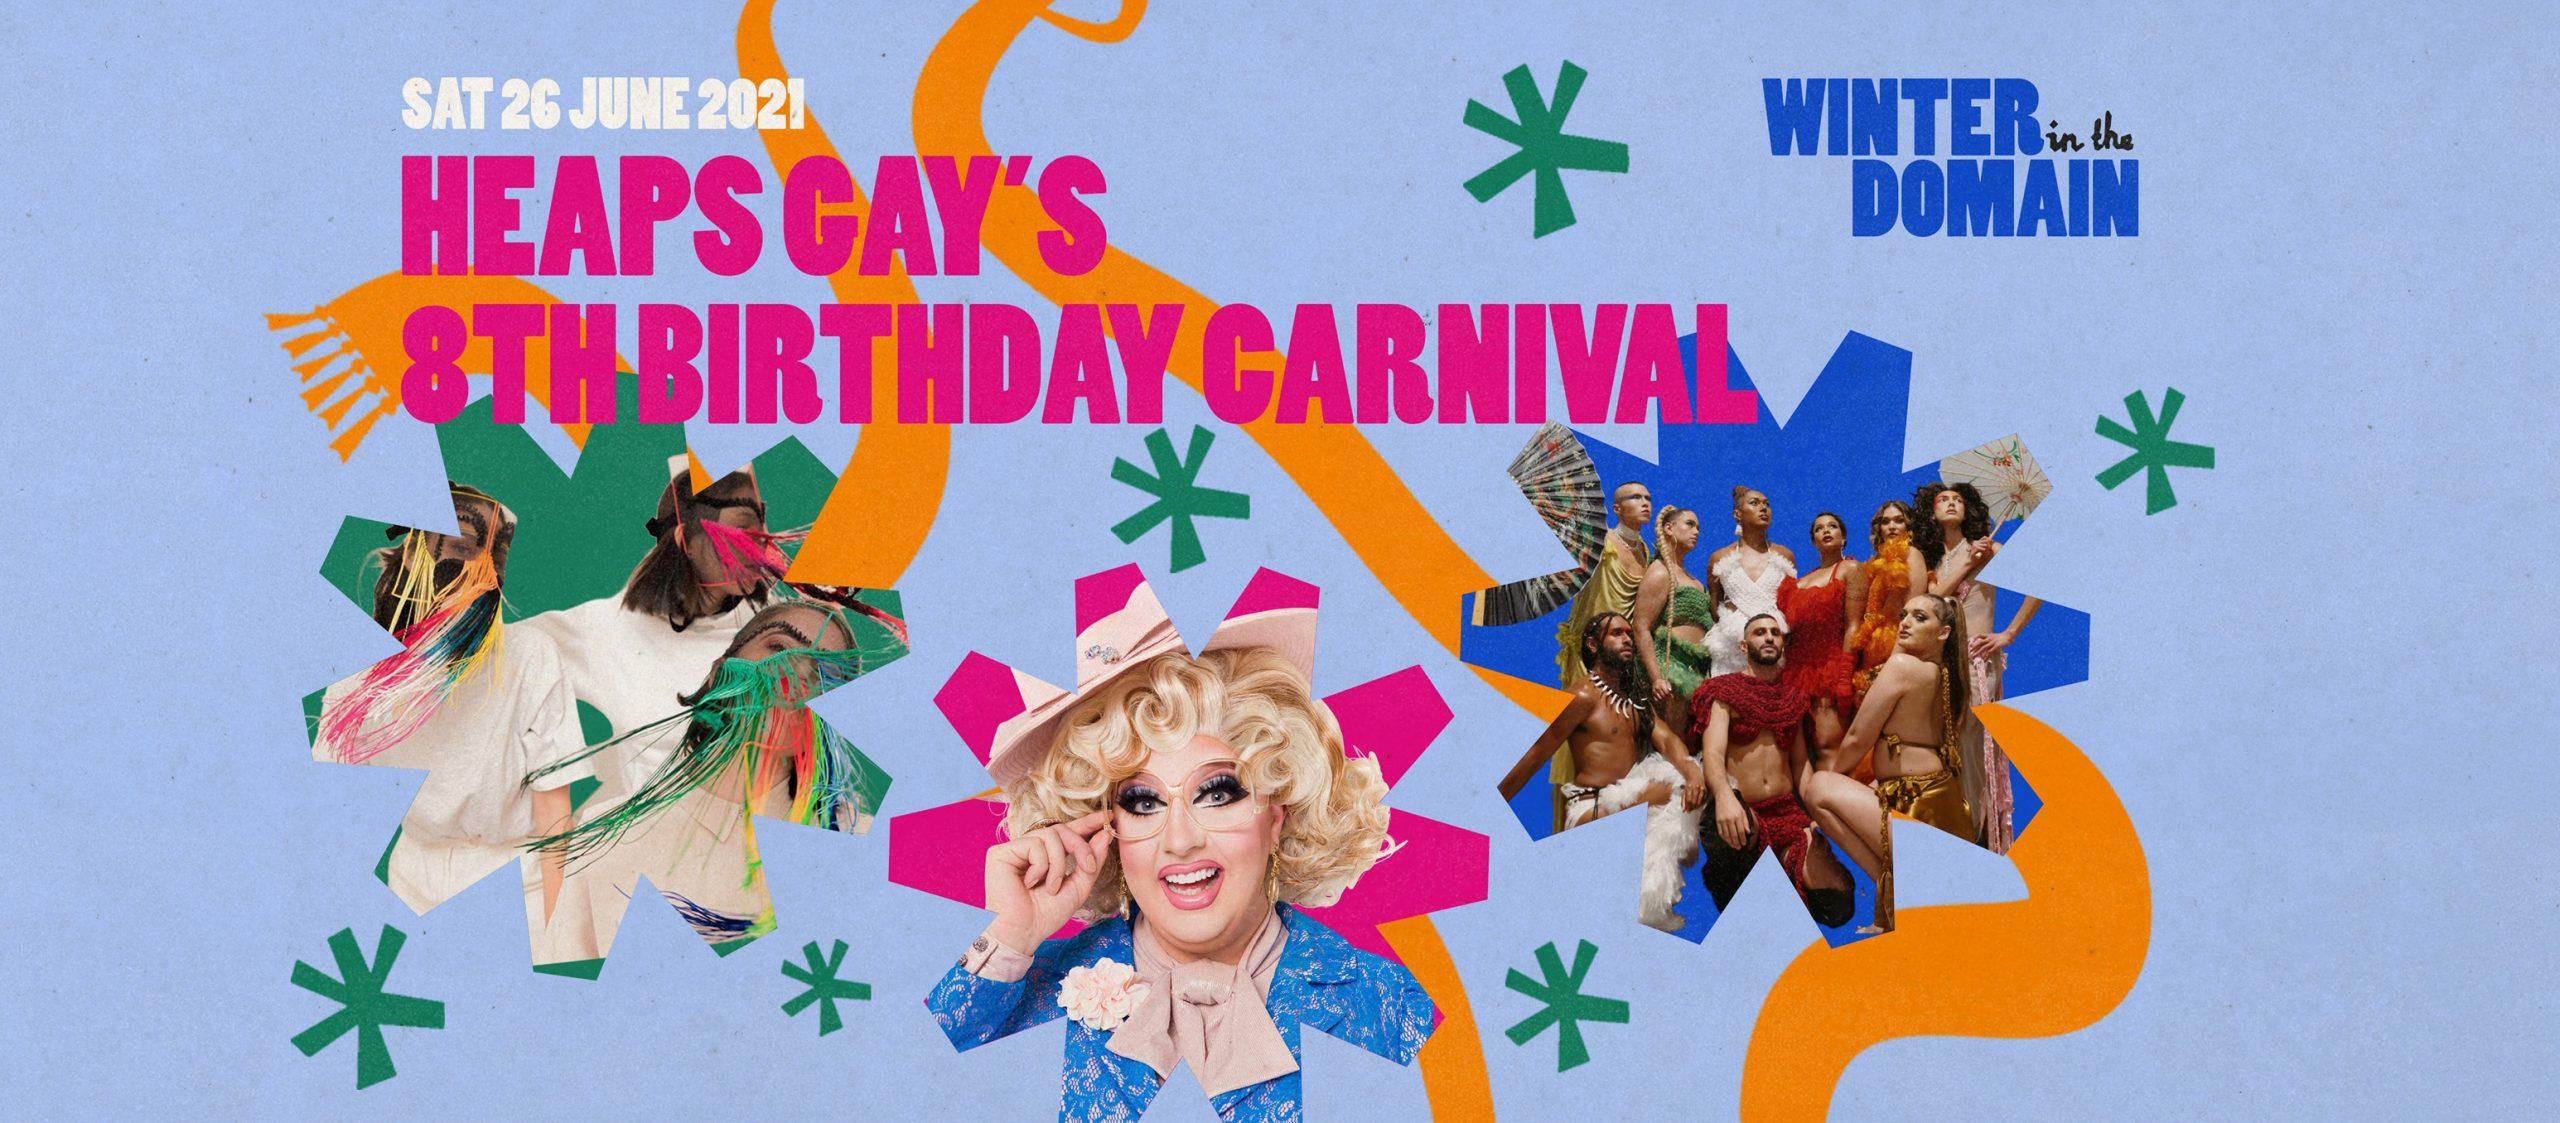 Heaps Gay's 8th Birthday Carnival